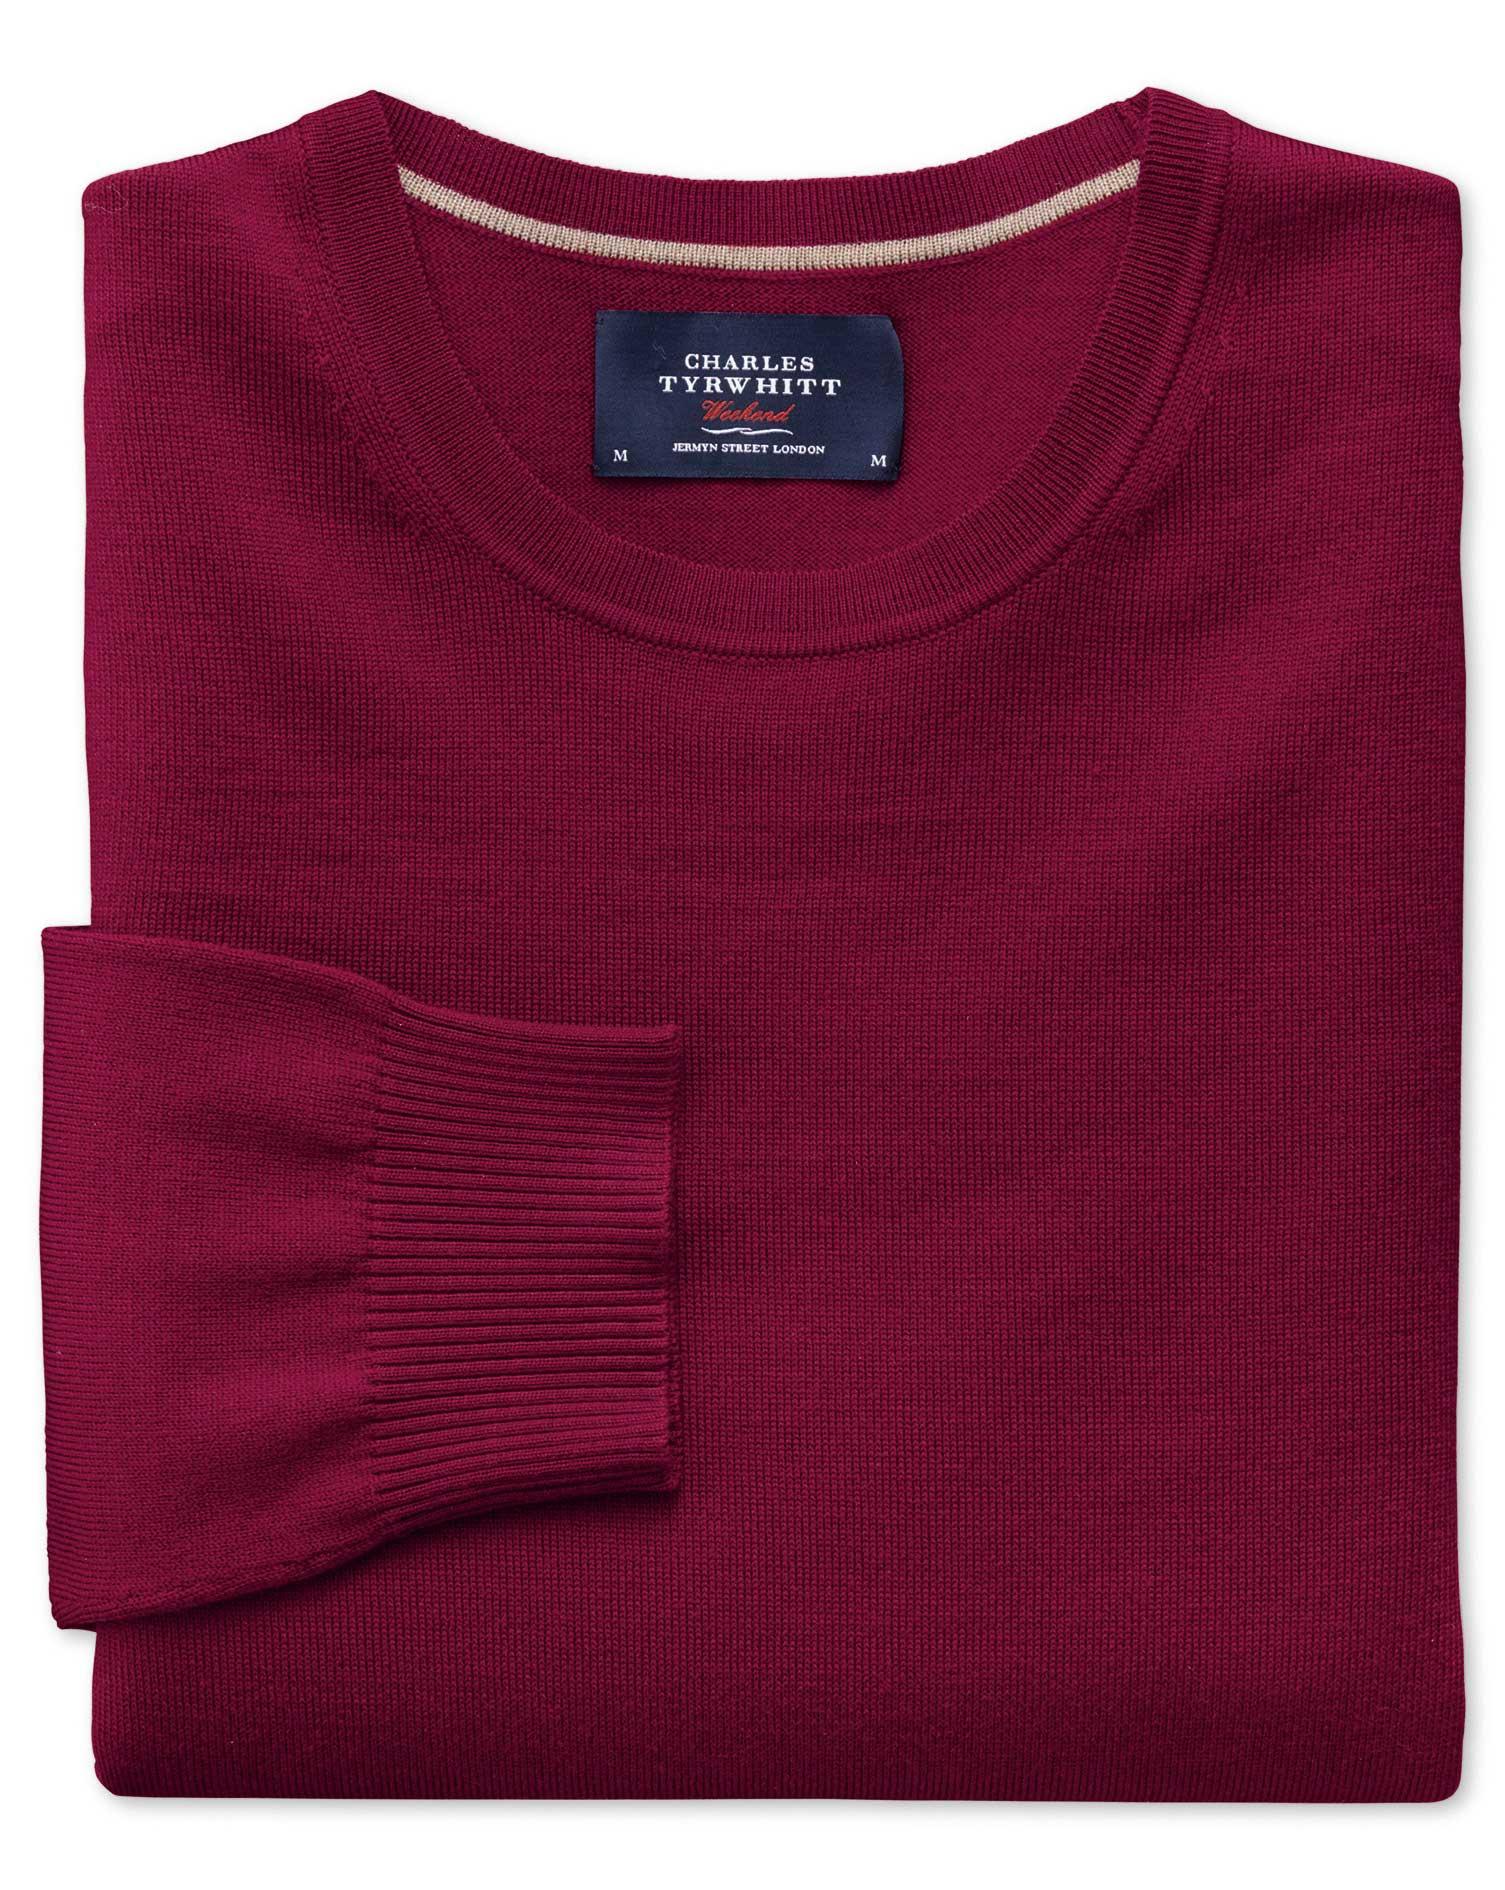 Dark Red Merino Wool Crew Neck Jumper Size Medium by Charles Tyrwhitt